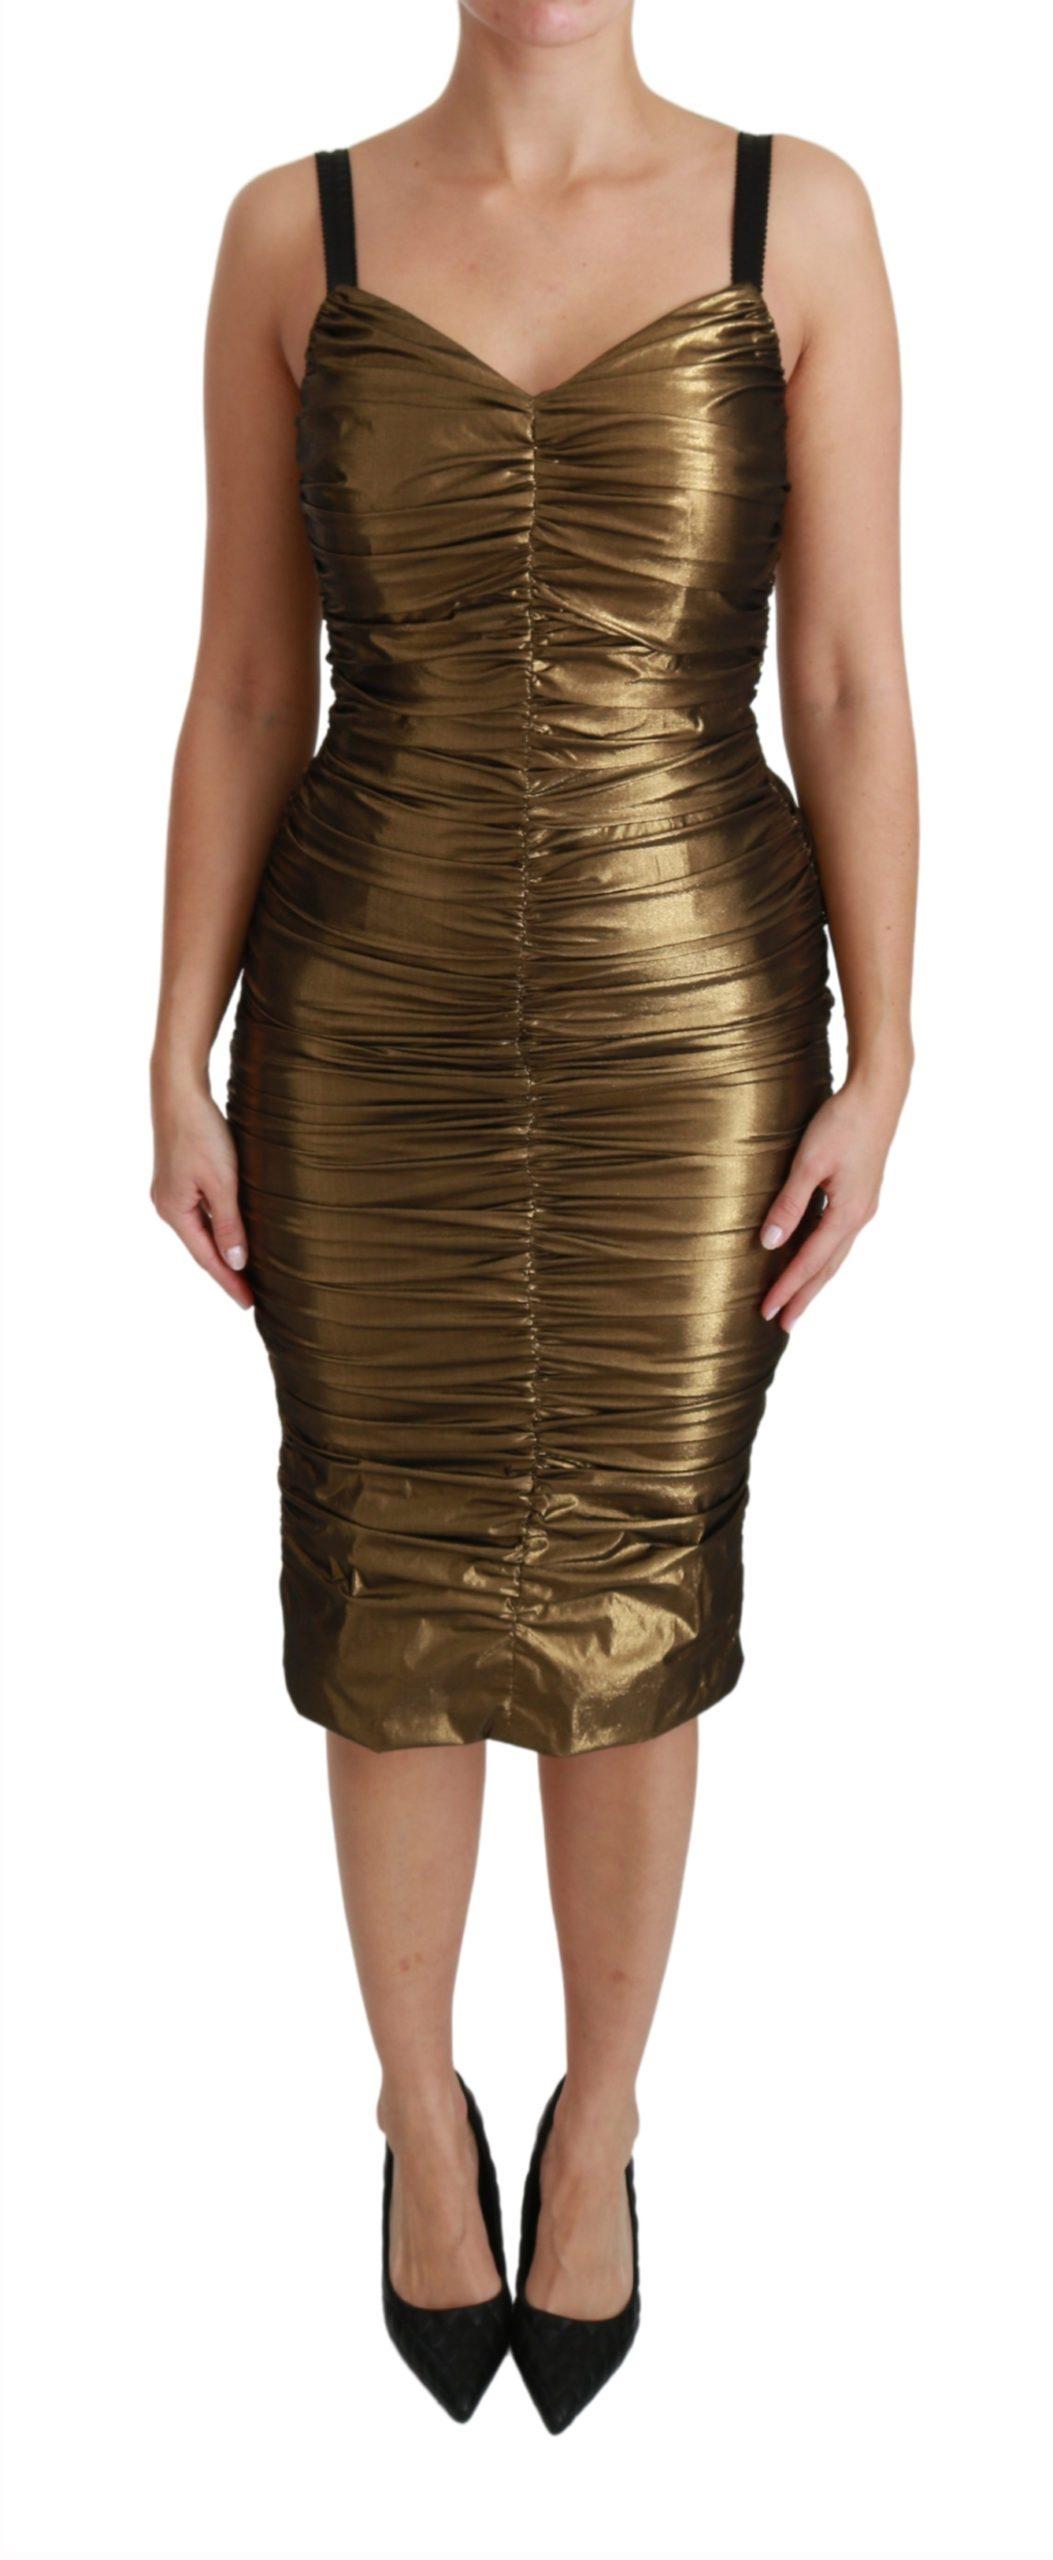 Dolce & Gabbana Women's Metallic Stretch Ruched Dress Gold DR2489 - IT36 | XS